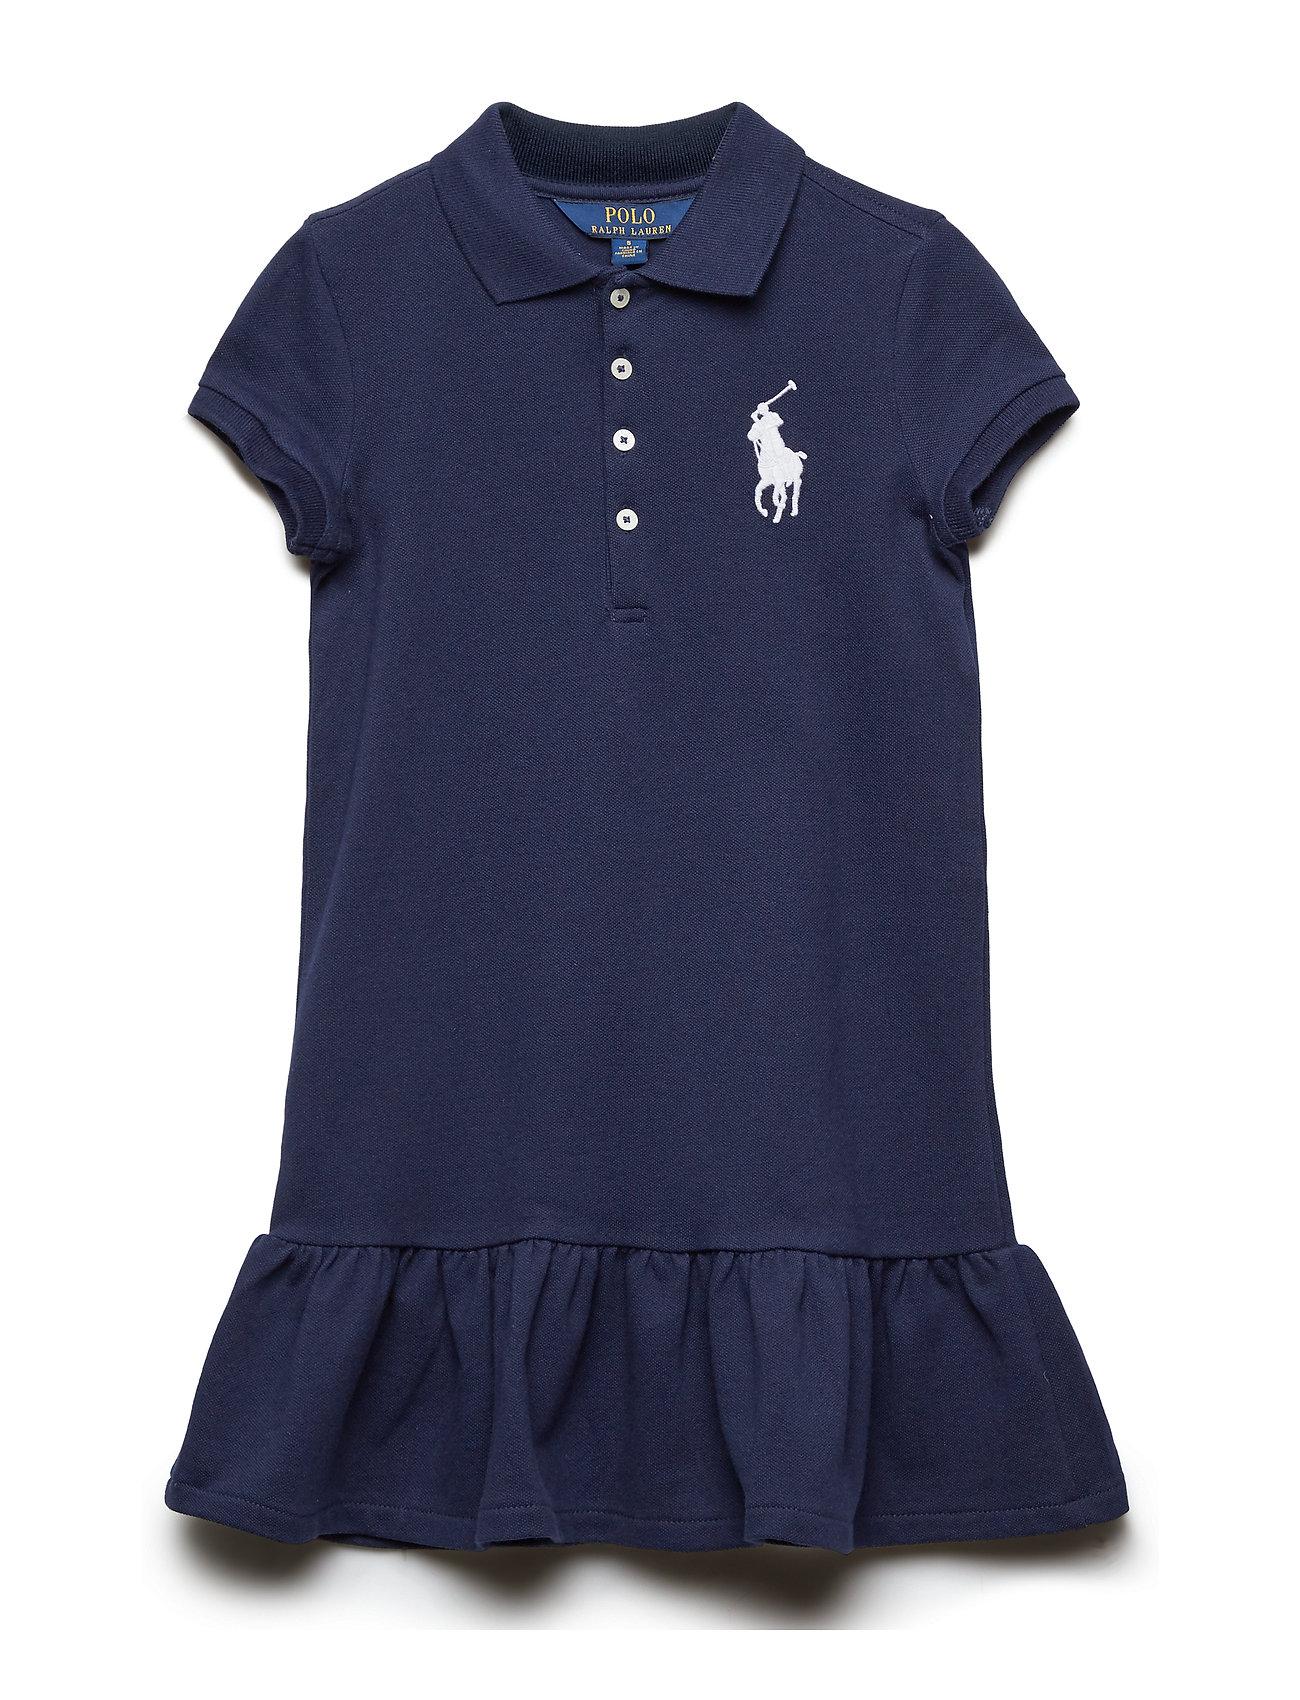 Ralph Lauren Kids Big Pony Short-Sleeve Dress - FRENCH NAVY